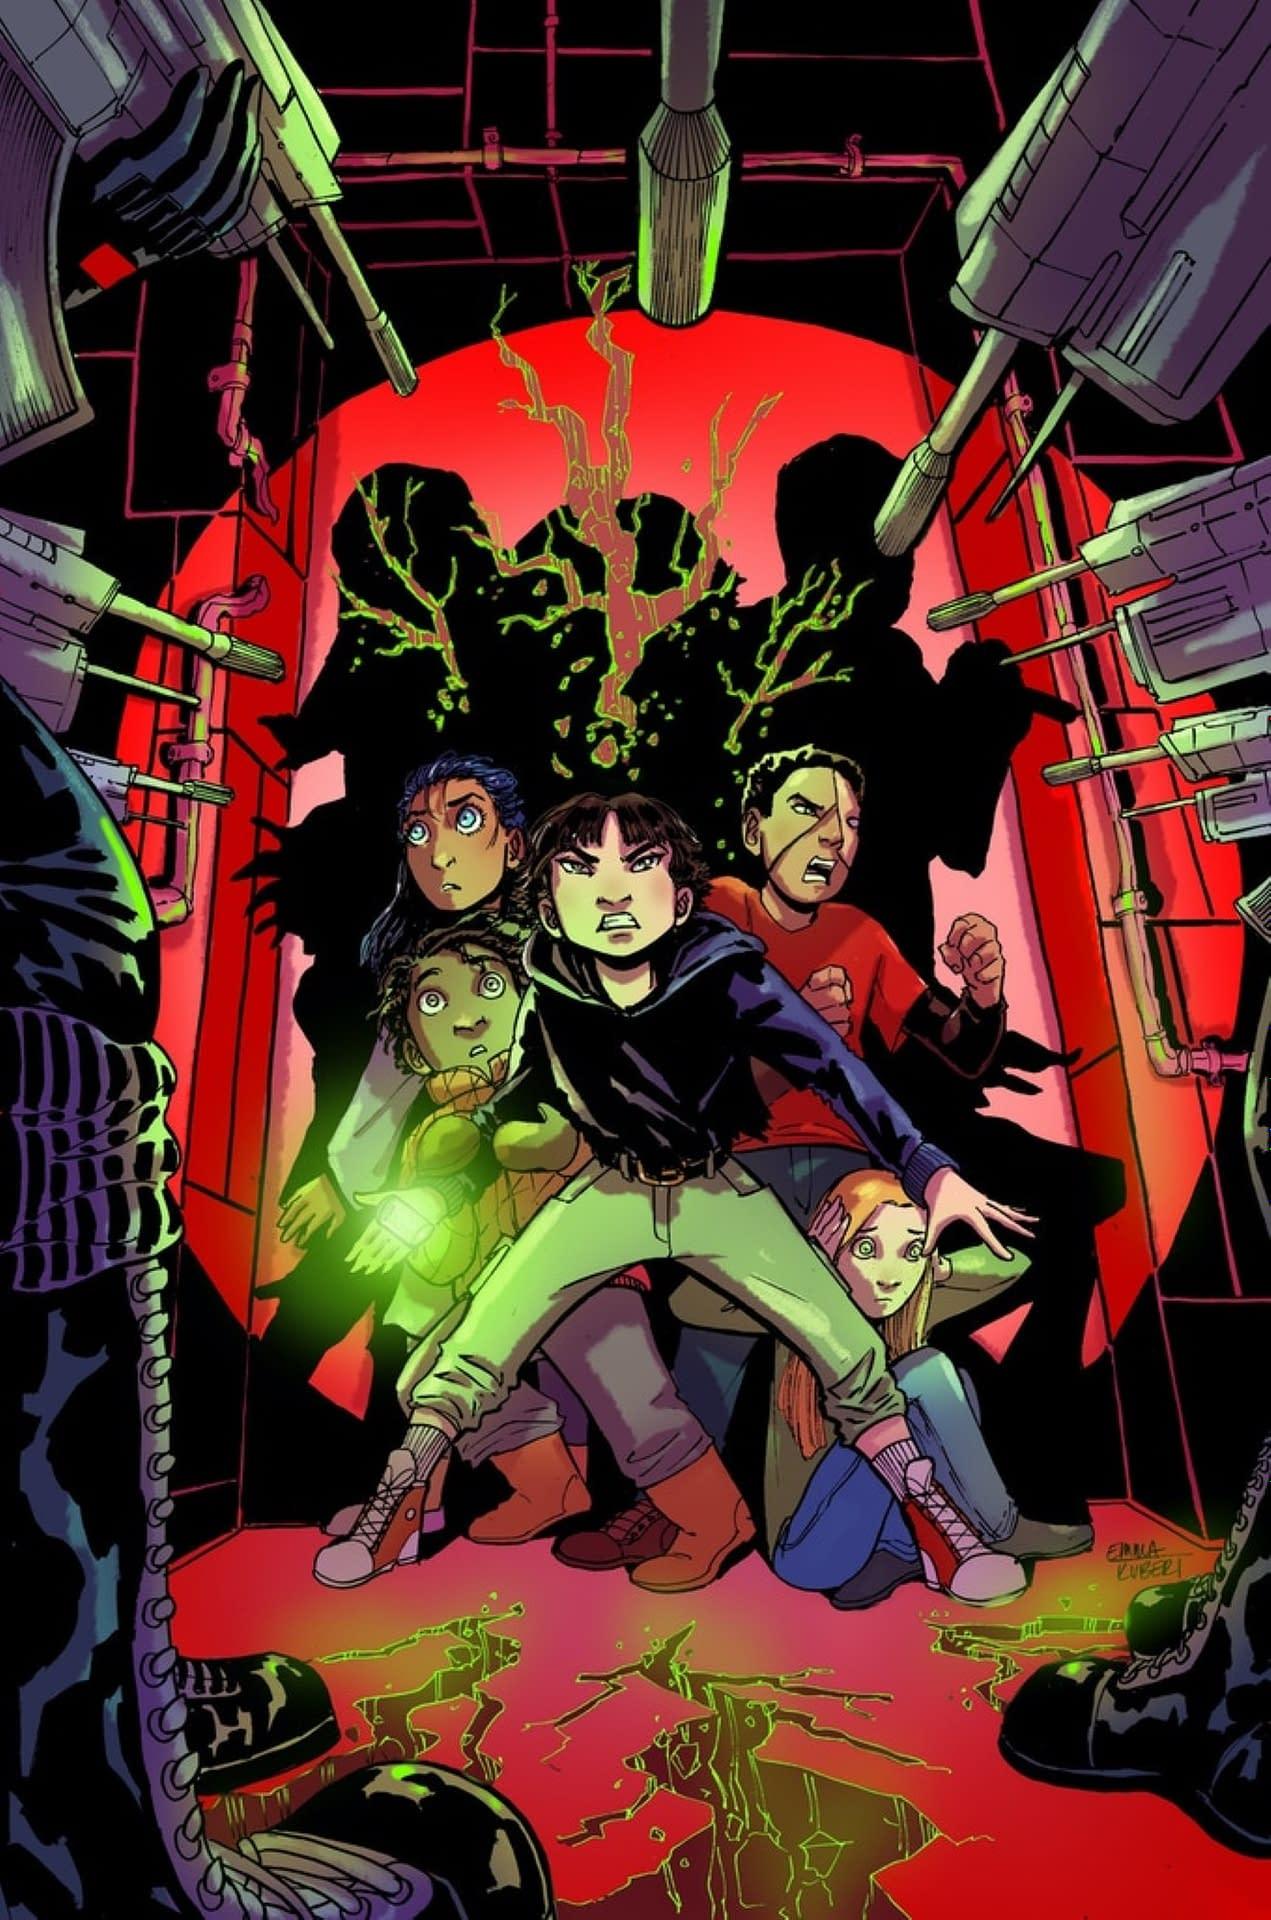 Inkblot #1 Main Cover Image Comics 2020 Emma Kubert and Rusty Gladd